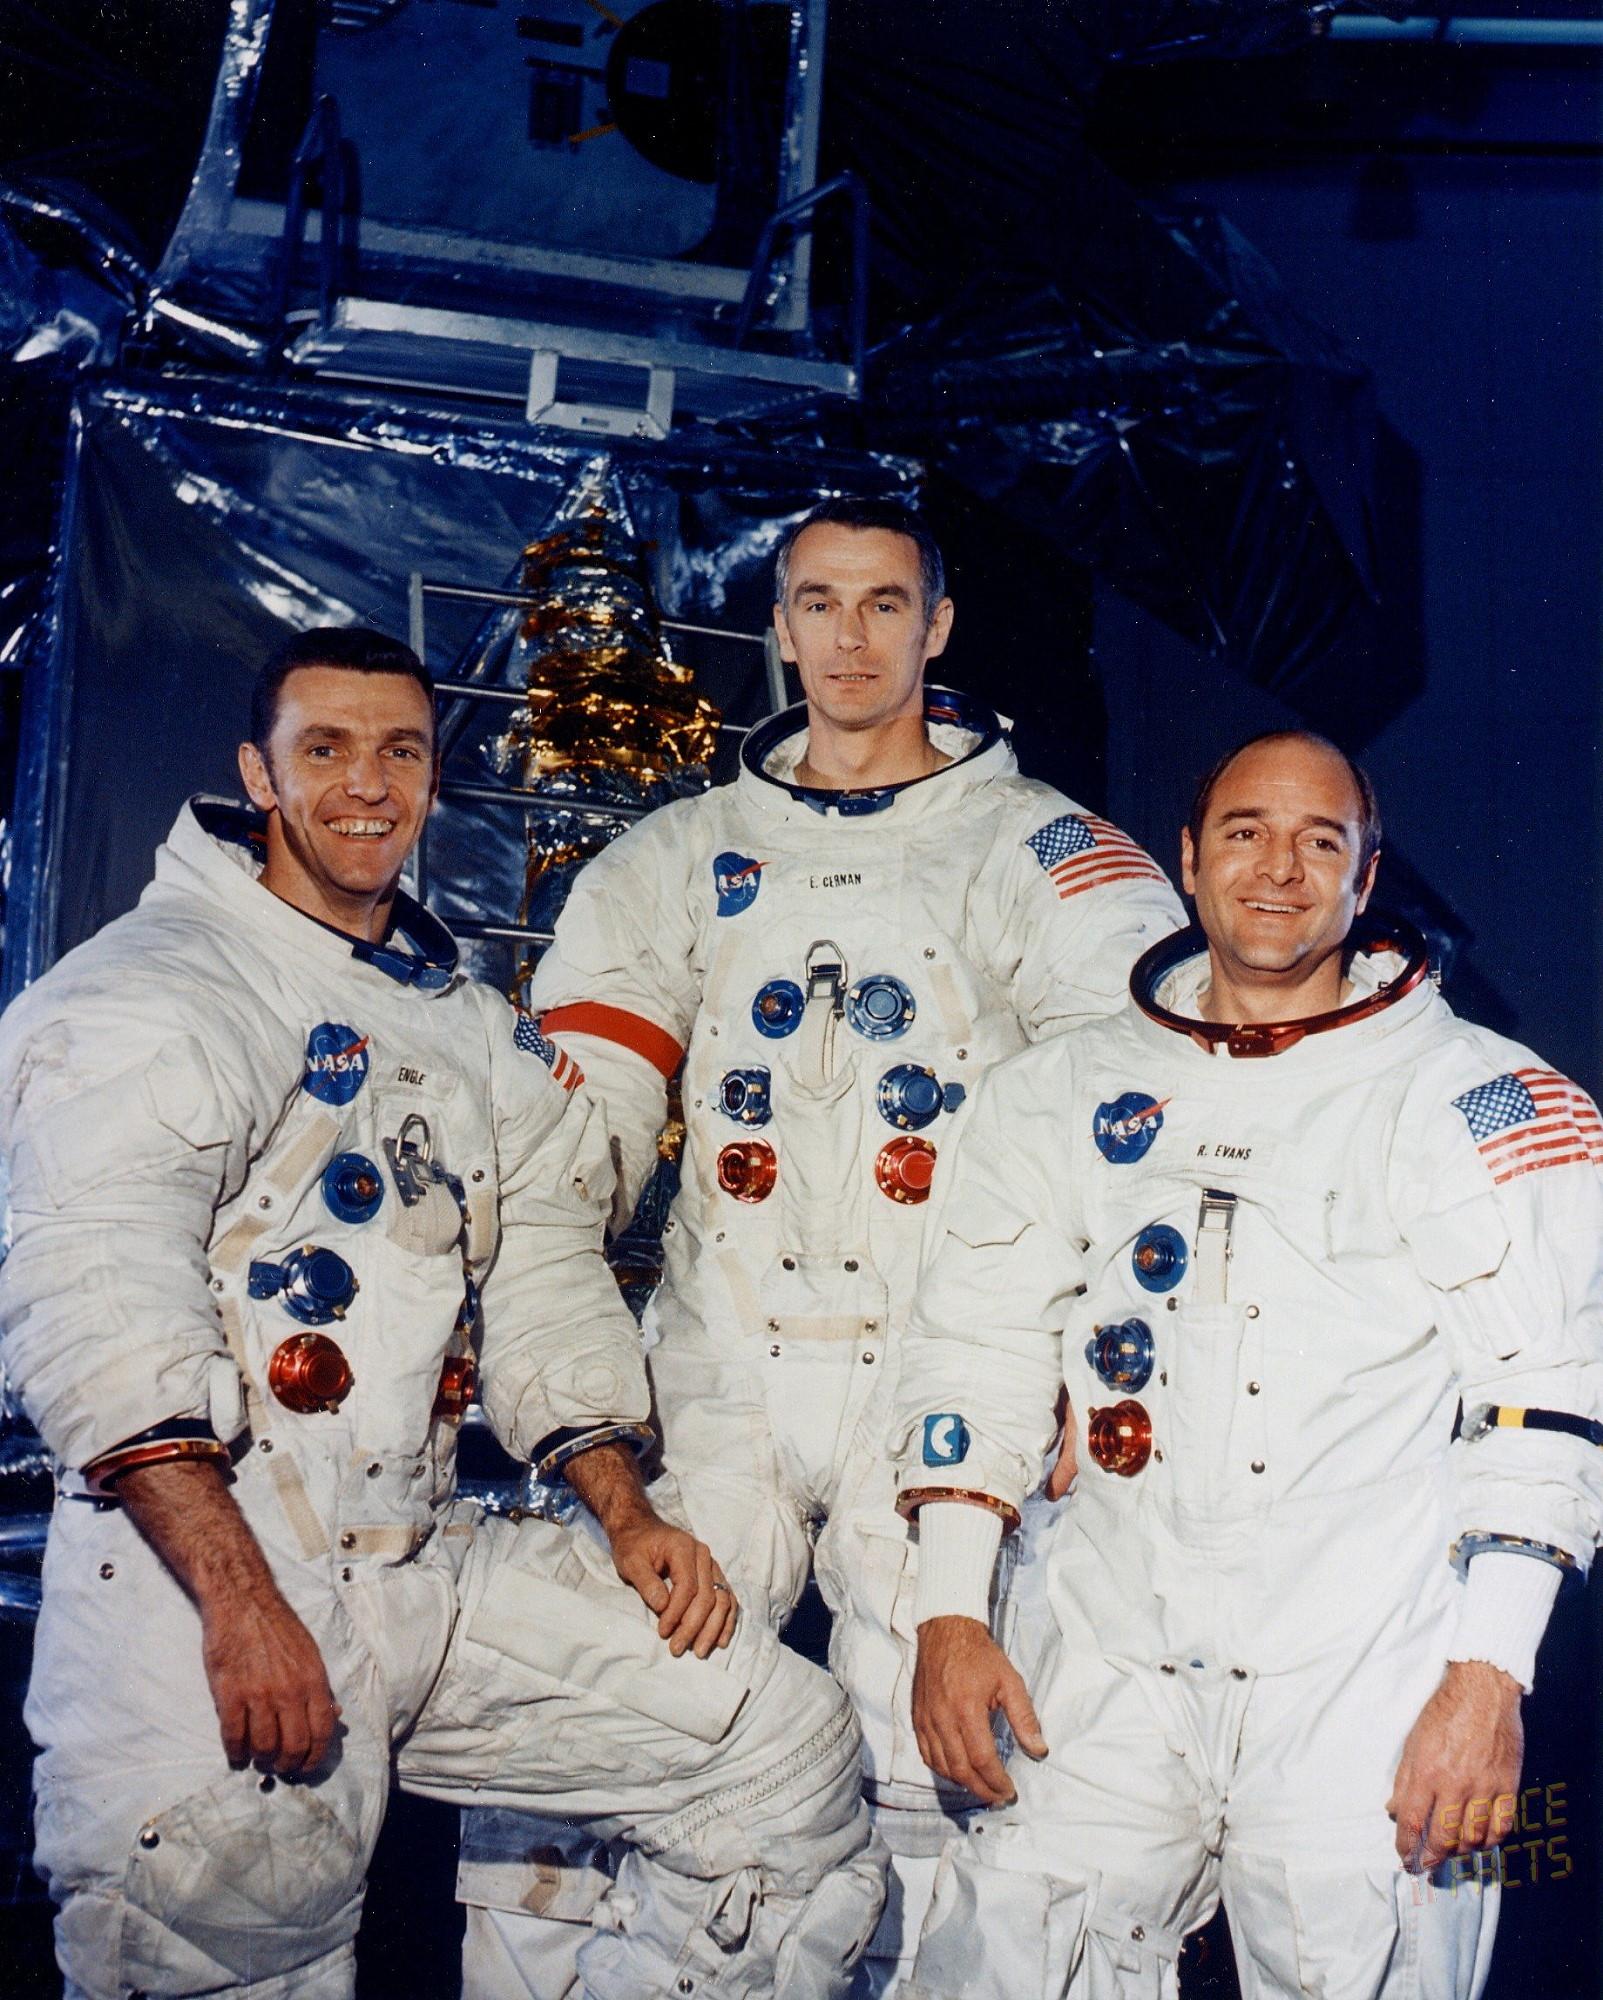 Spaceflight mission report: Apollo 14